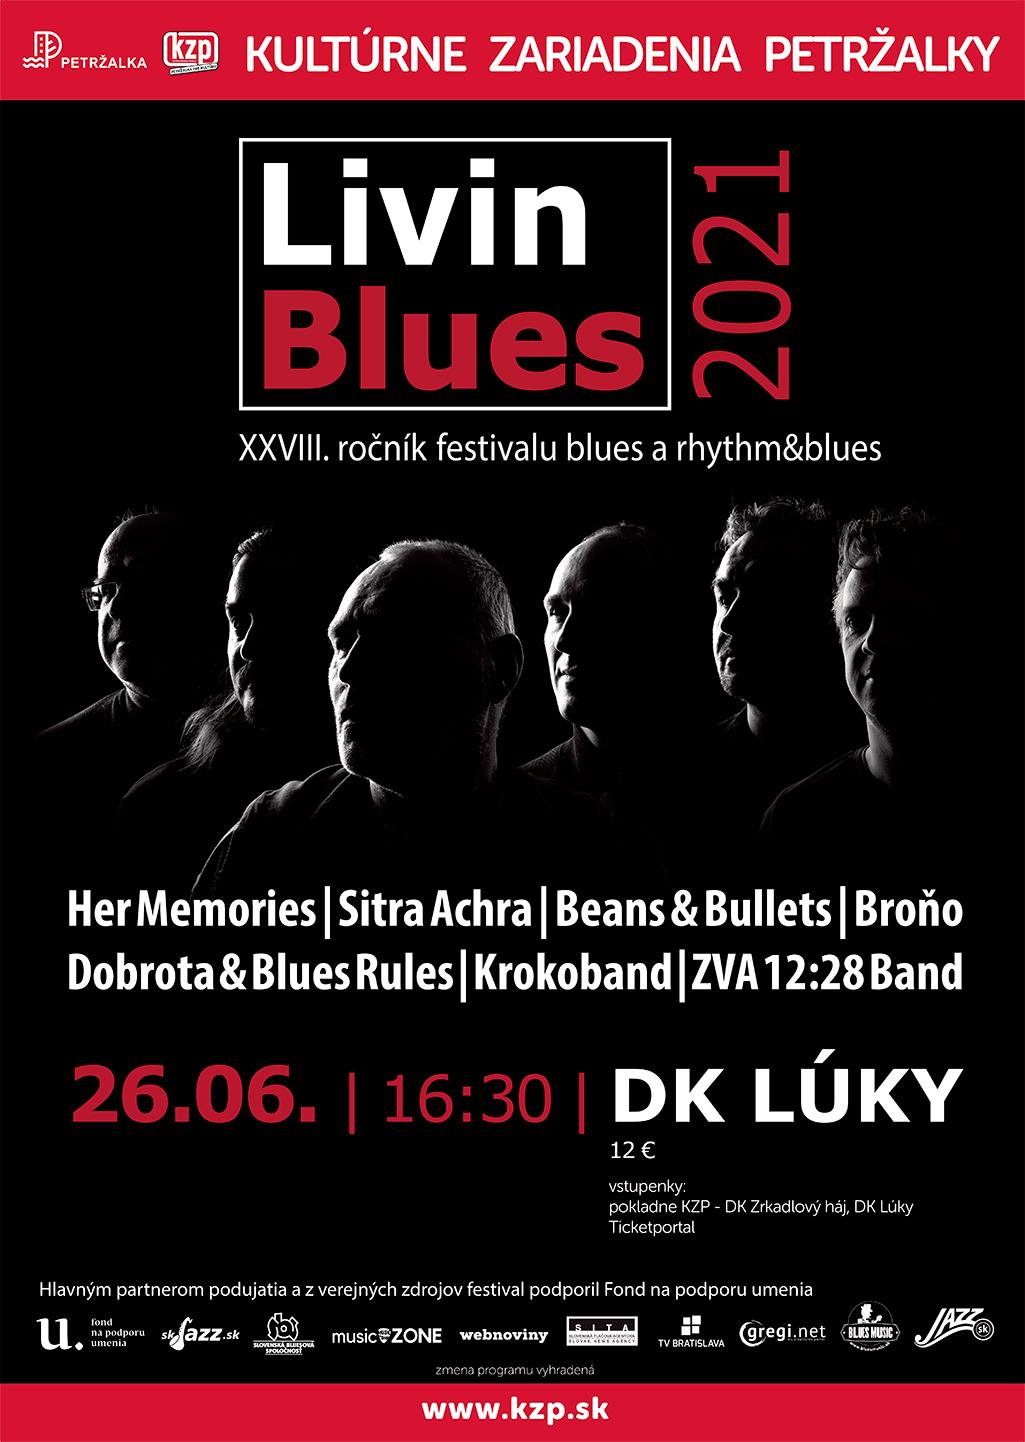 Festival Livin Blues 2021 DK Lúky Bratilava